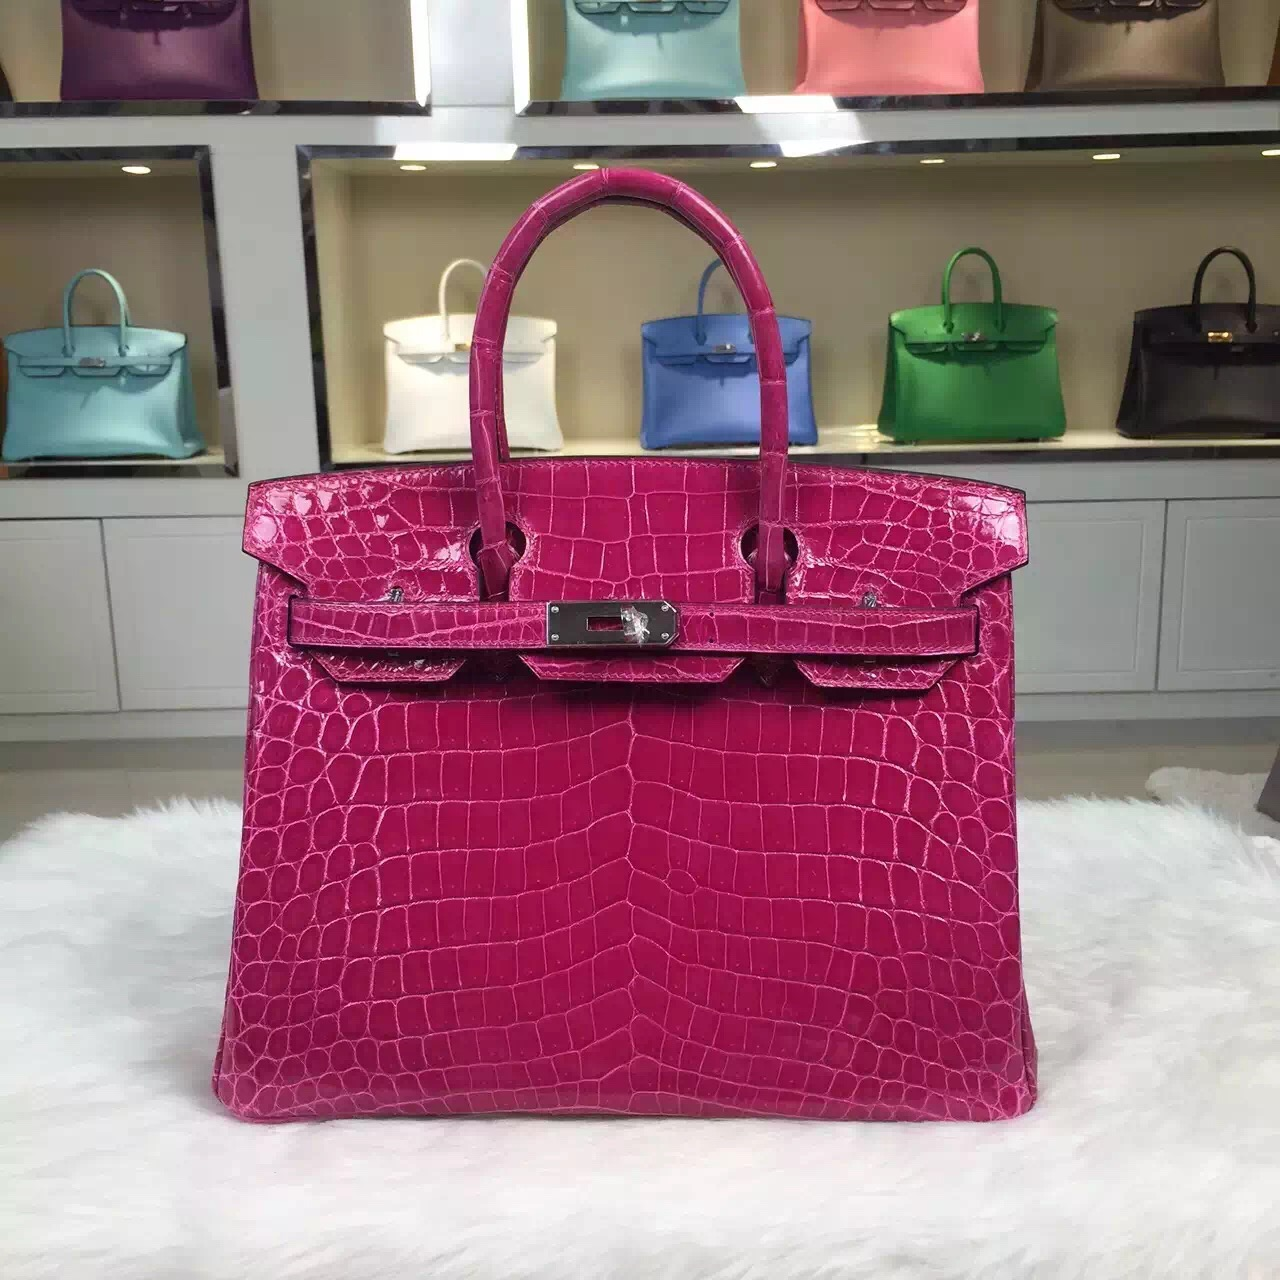 2015 New Women's Handbag Hermes J5 Rose Scheherazade Nicotious Crocodile Skin Birkin30CM